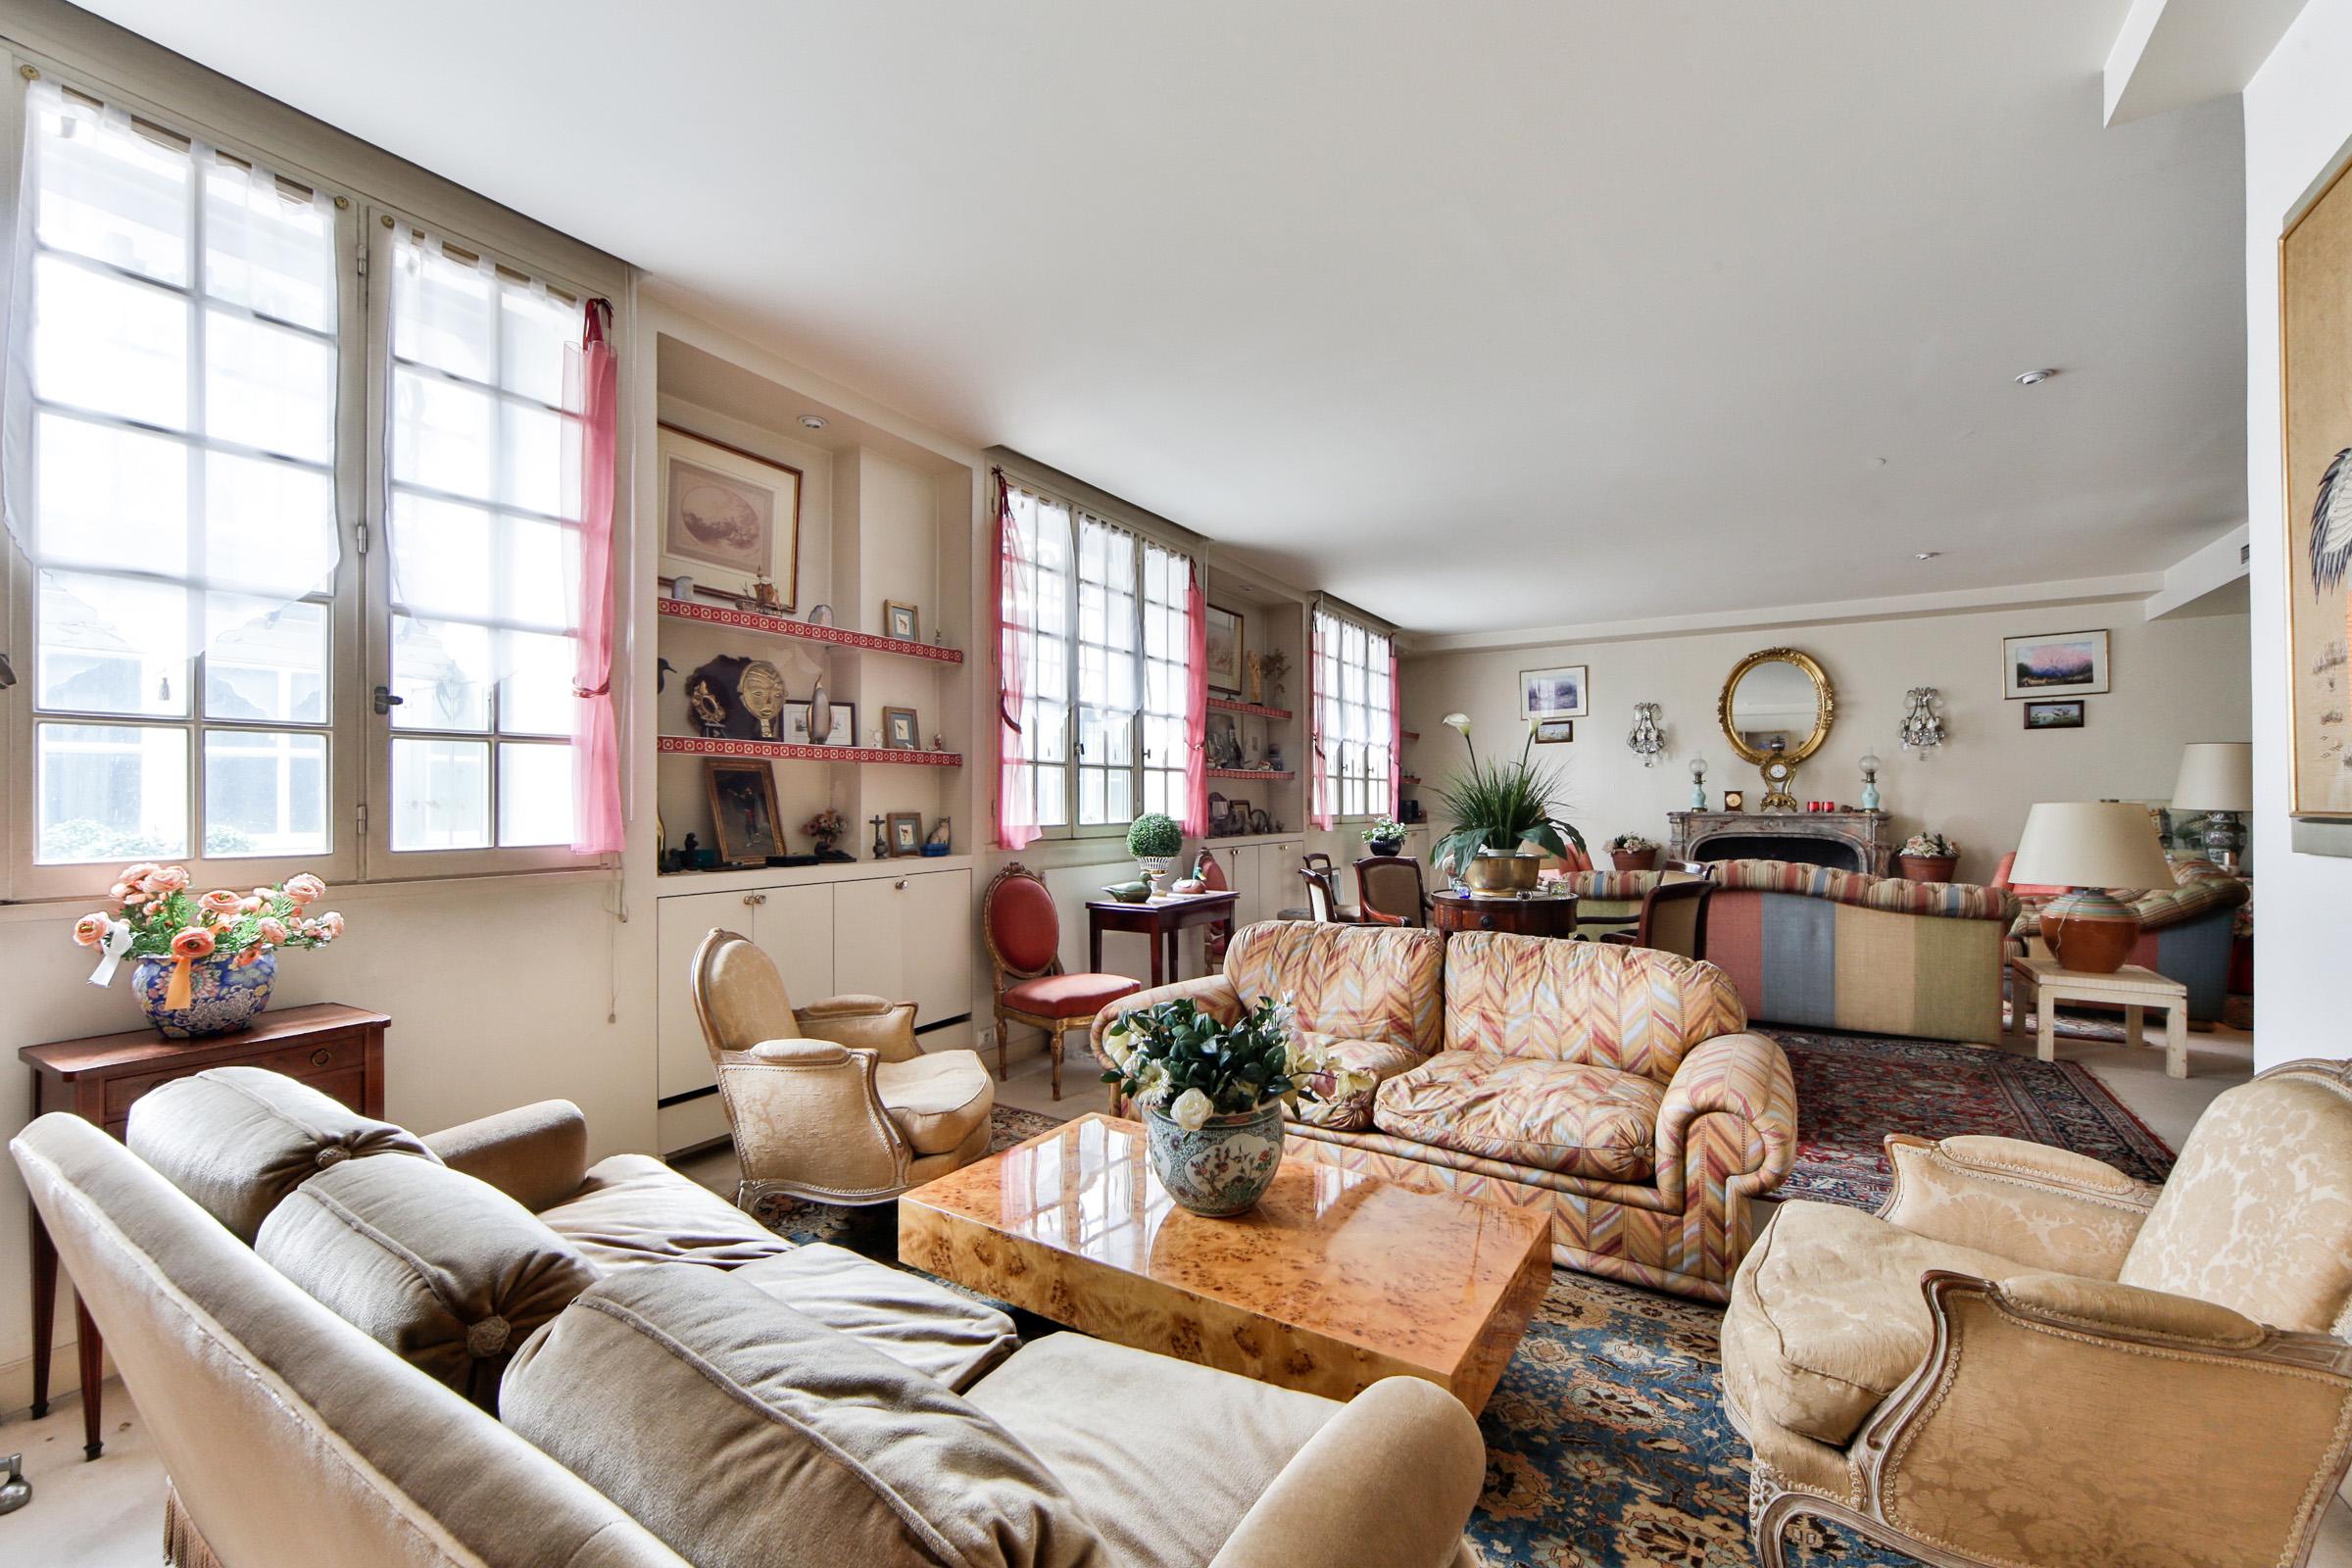 Appartamento per Vendita alle ore Apartment - Foch Paris, Parigi 75116 Francia